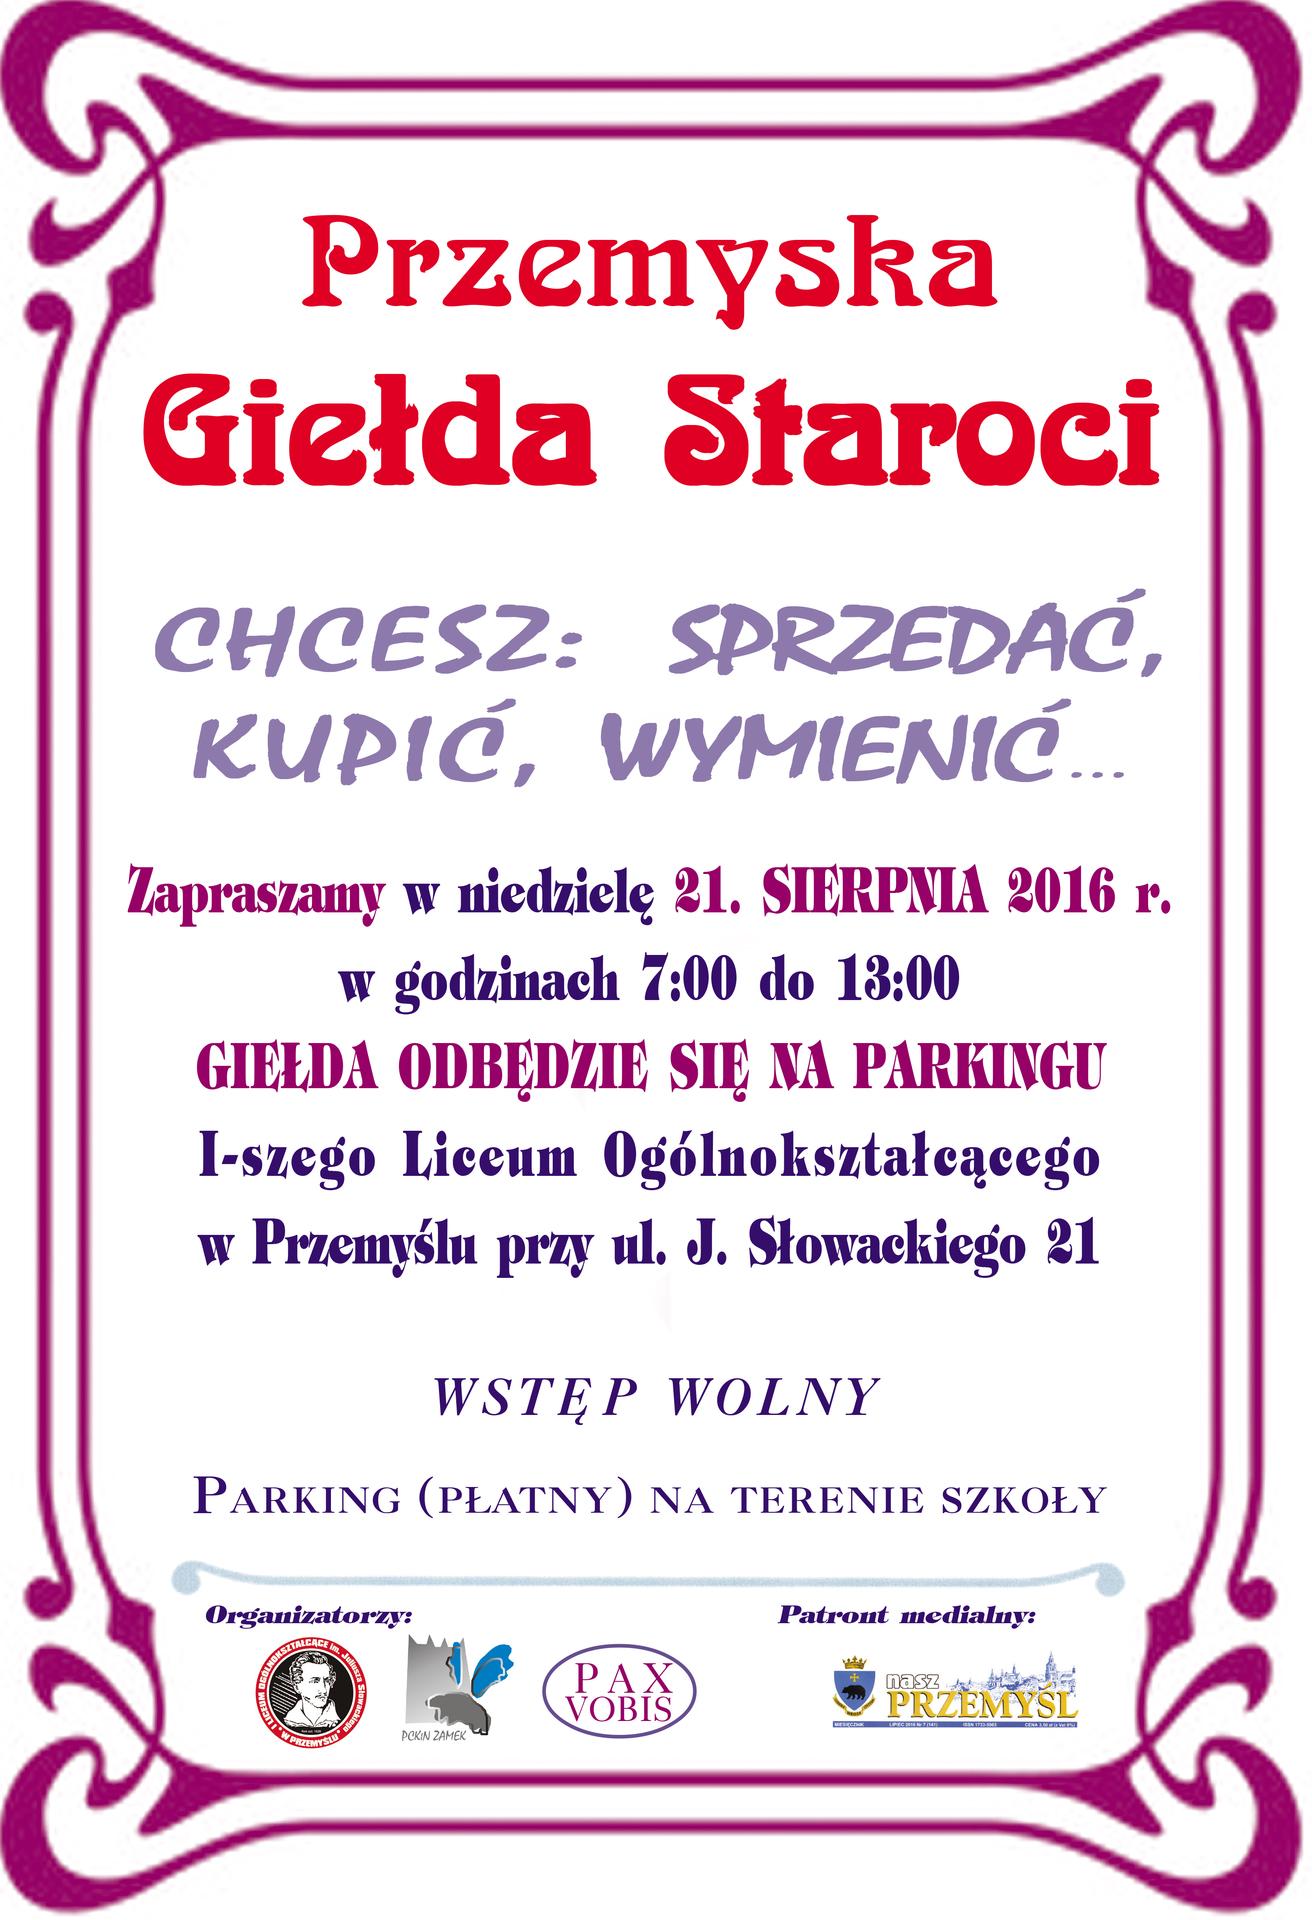 plaka_gielda_staroci_sierpien.jpeg